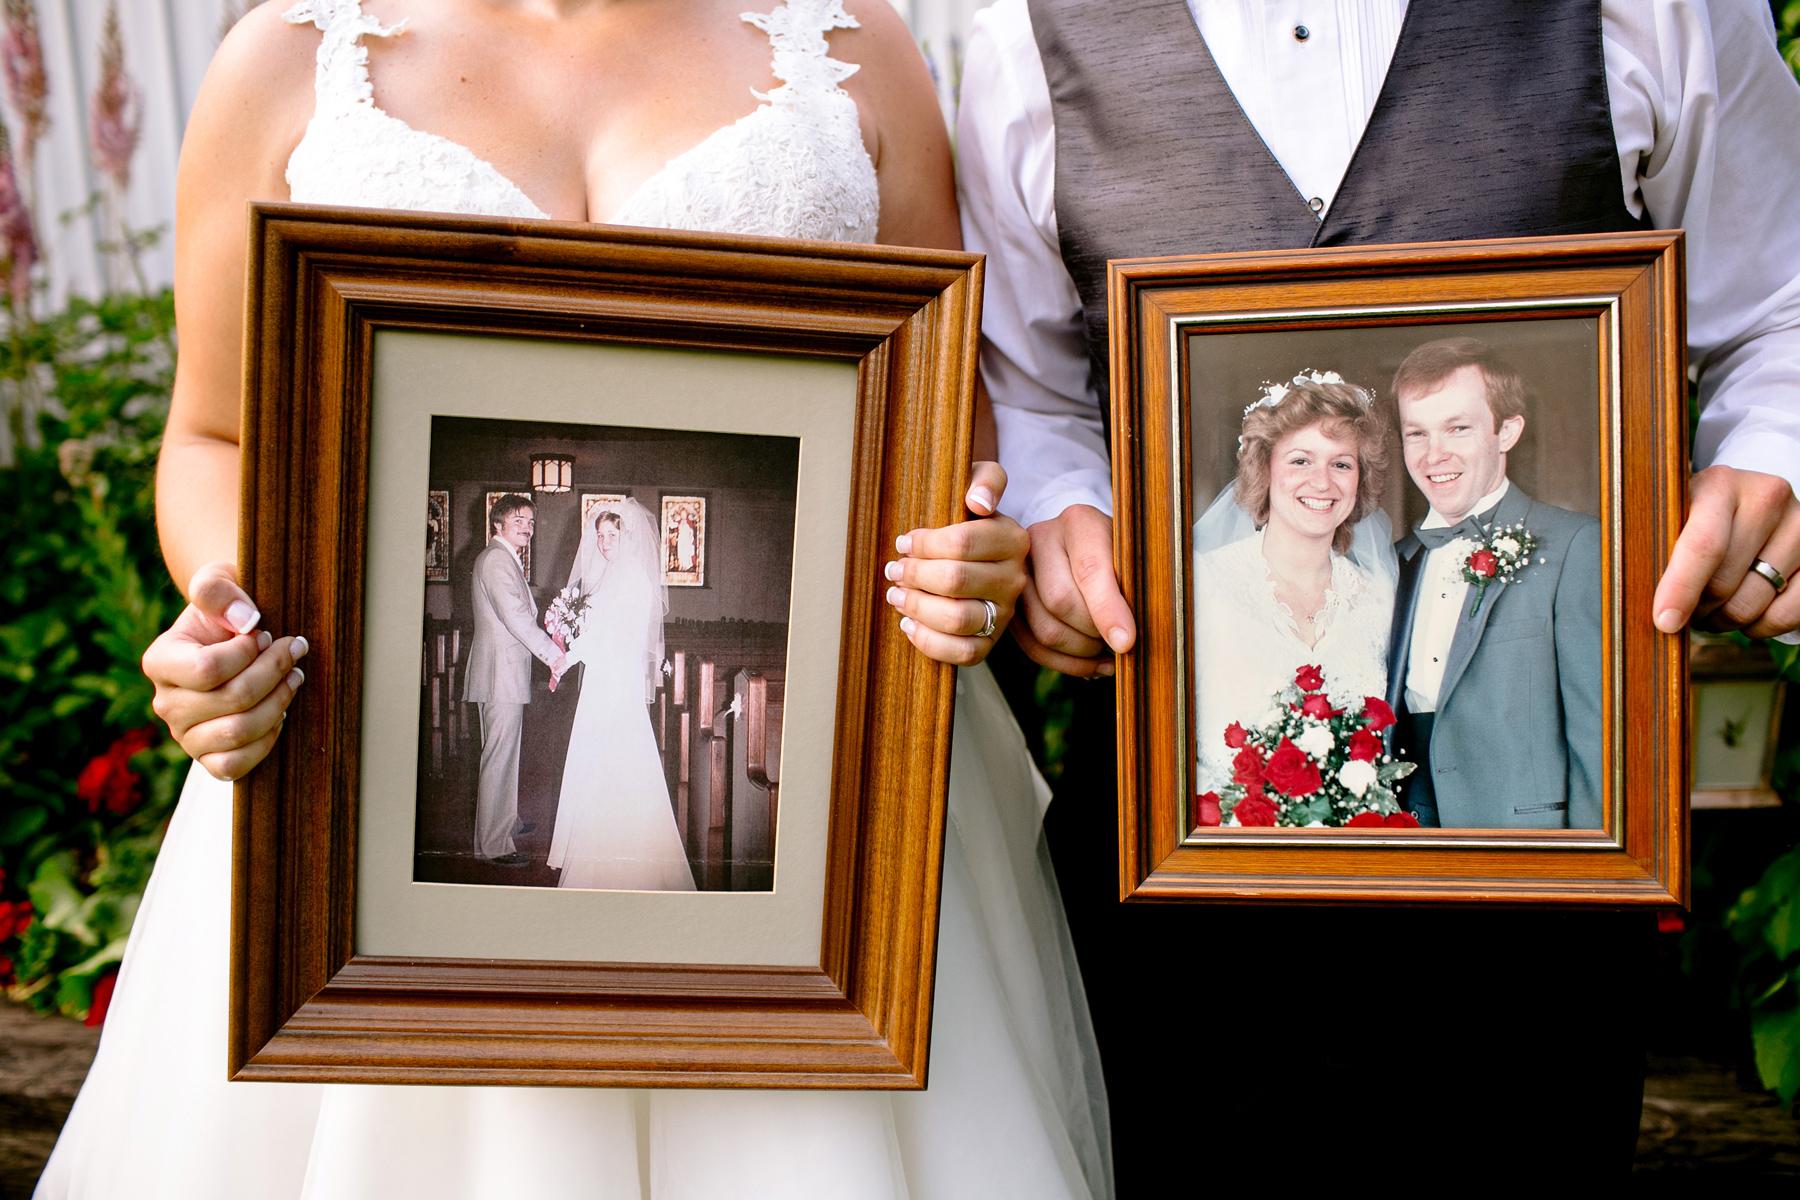 045-awesome-pei-wedding-photography-kandisebrown-jg2016